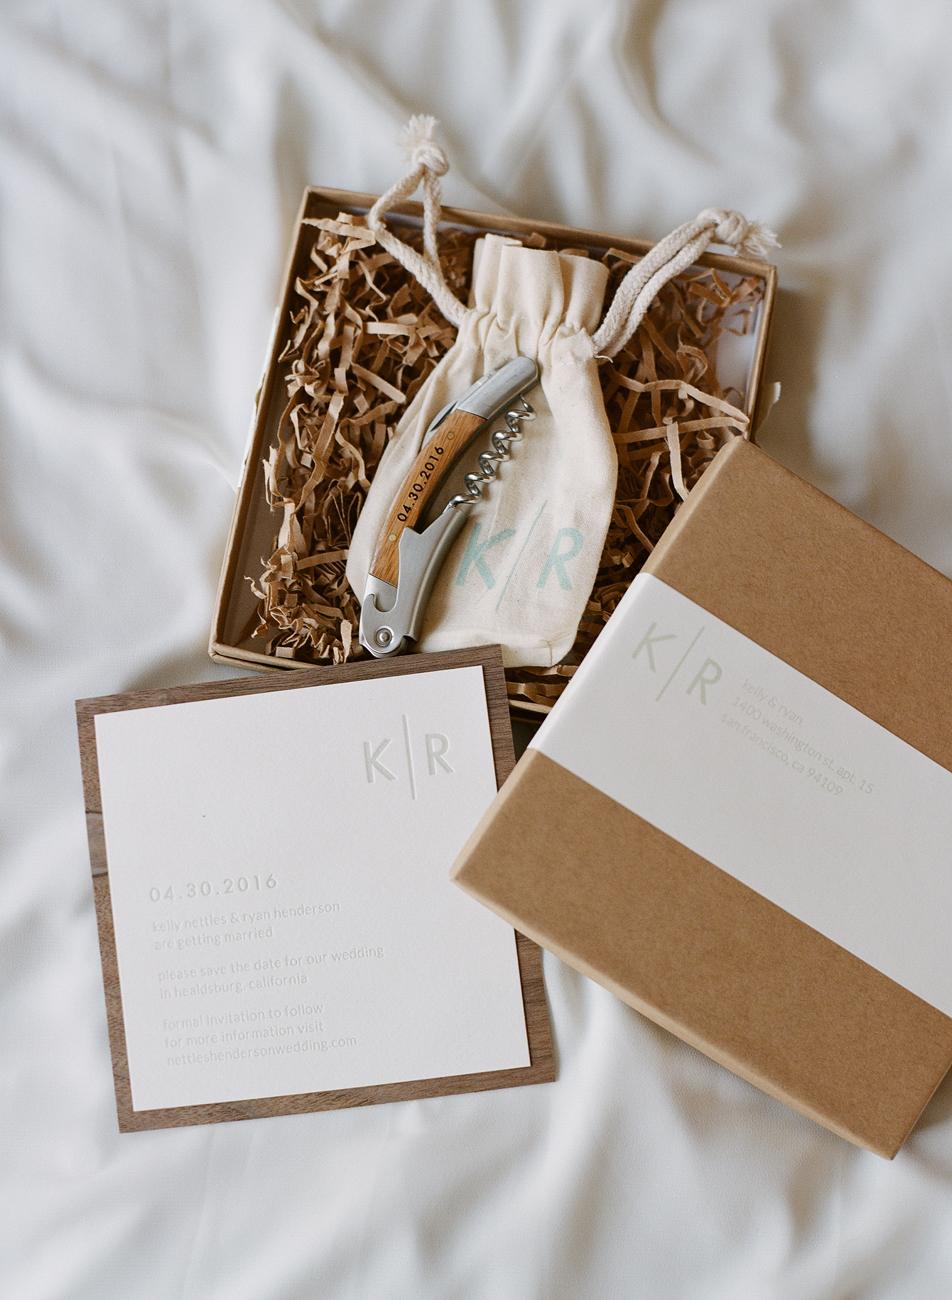 Wedding Guest Gift Packaging Design - KLN Design